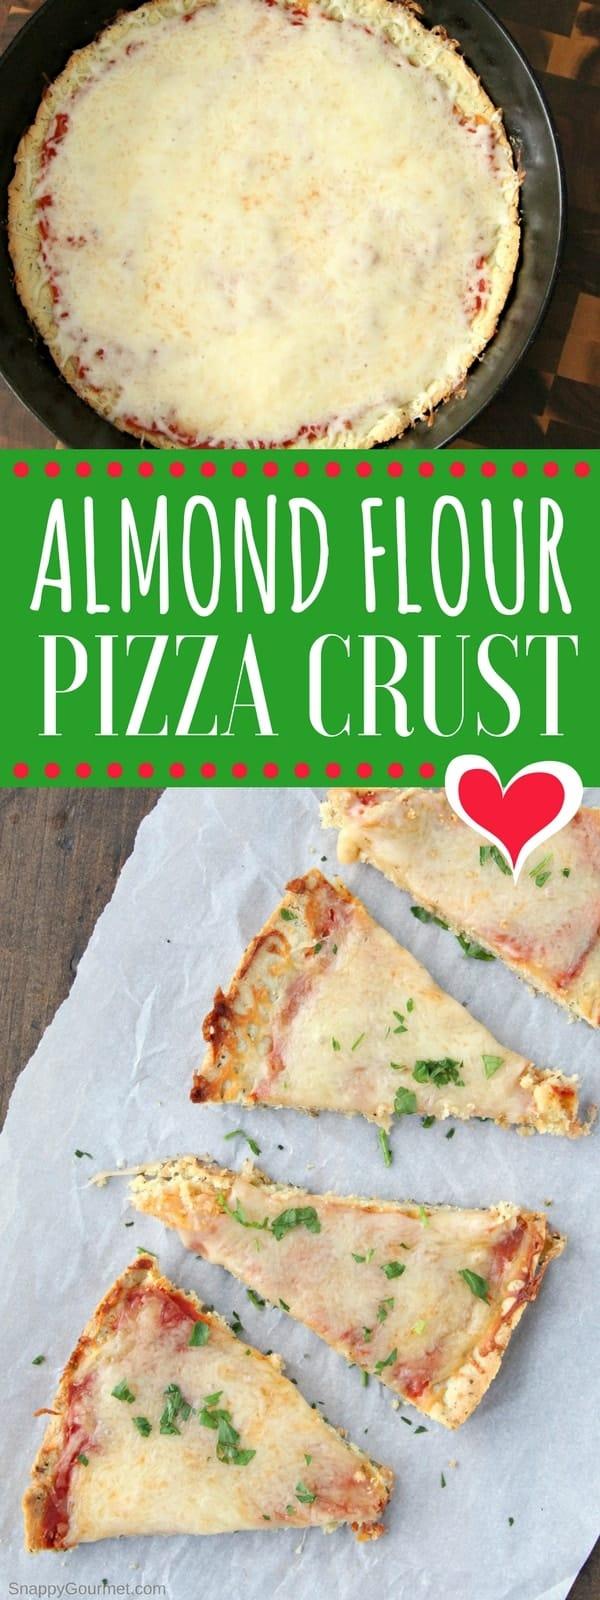 Almond Flour Pizza Crust Pin